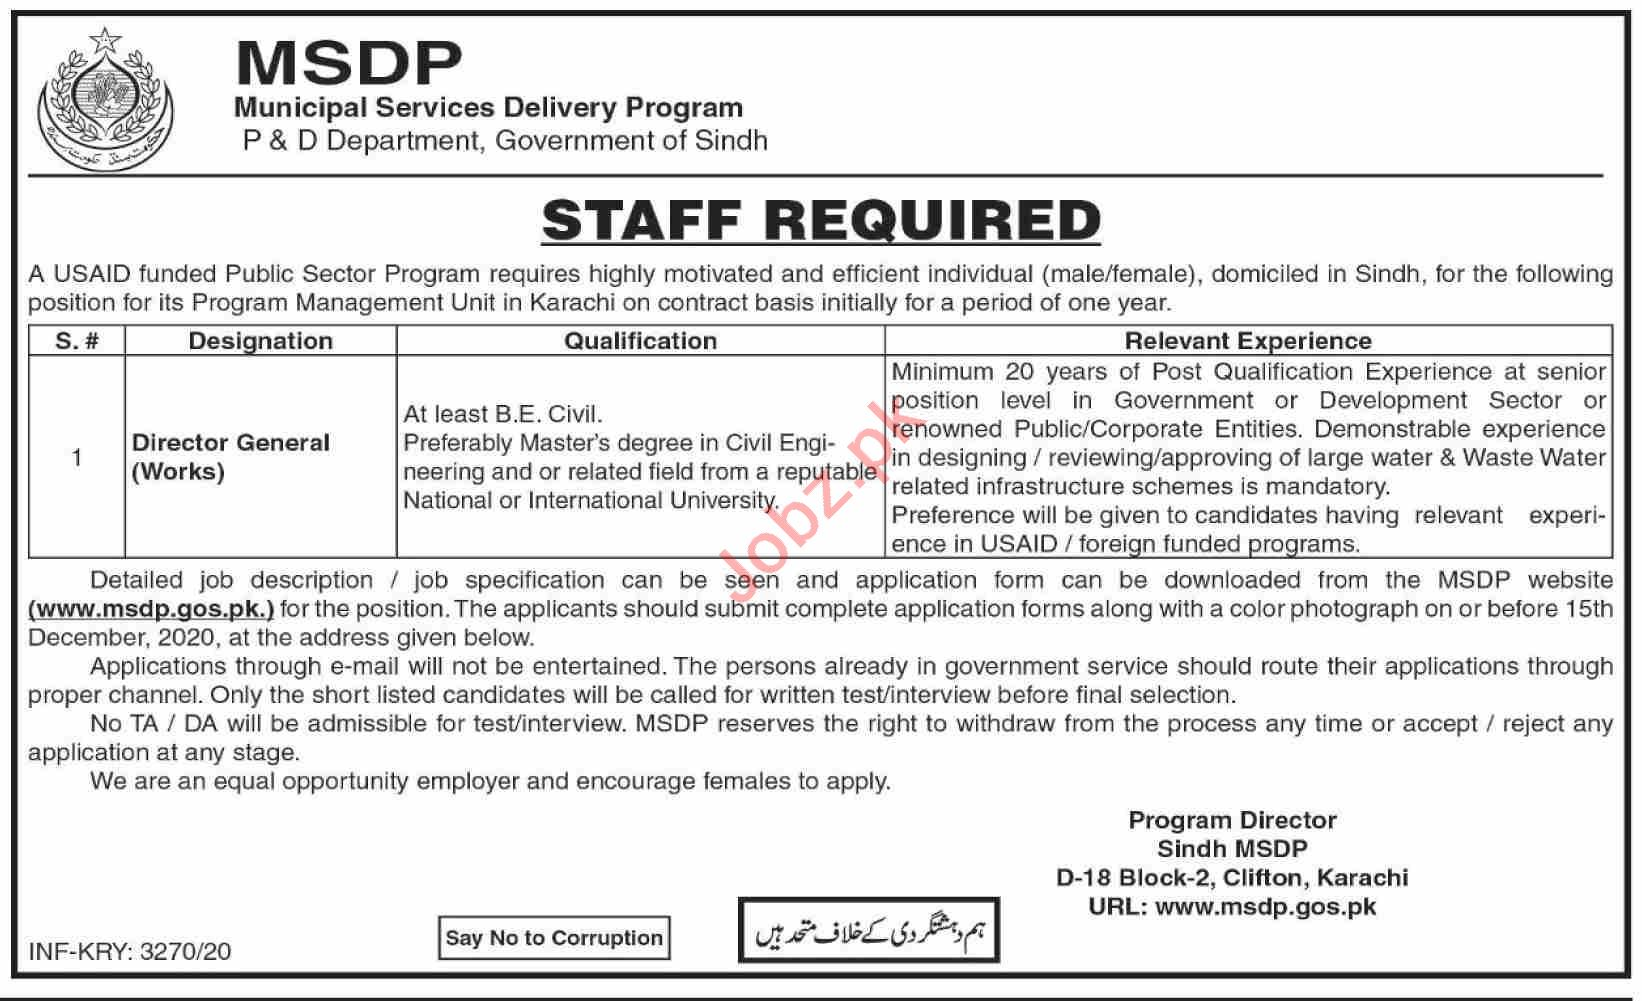 Municipal Services Delivery Program MSDP Karachi Jobs 2020